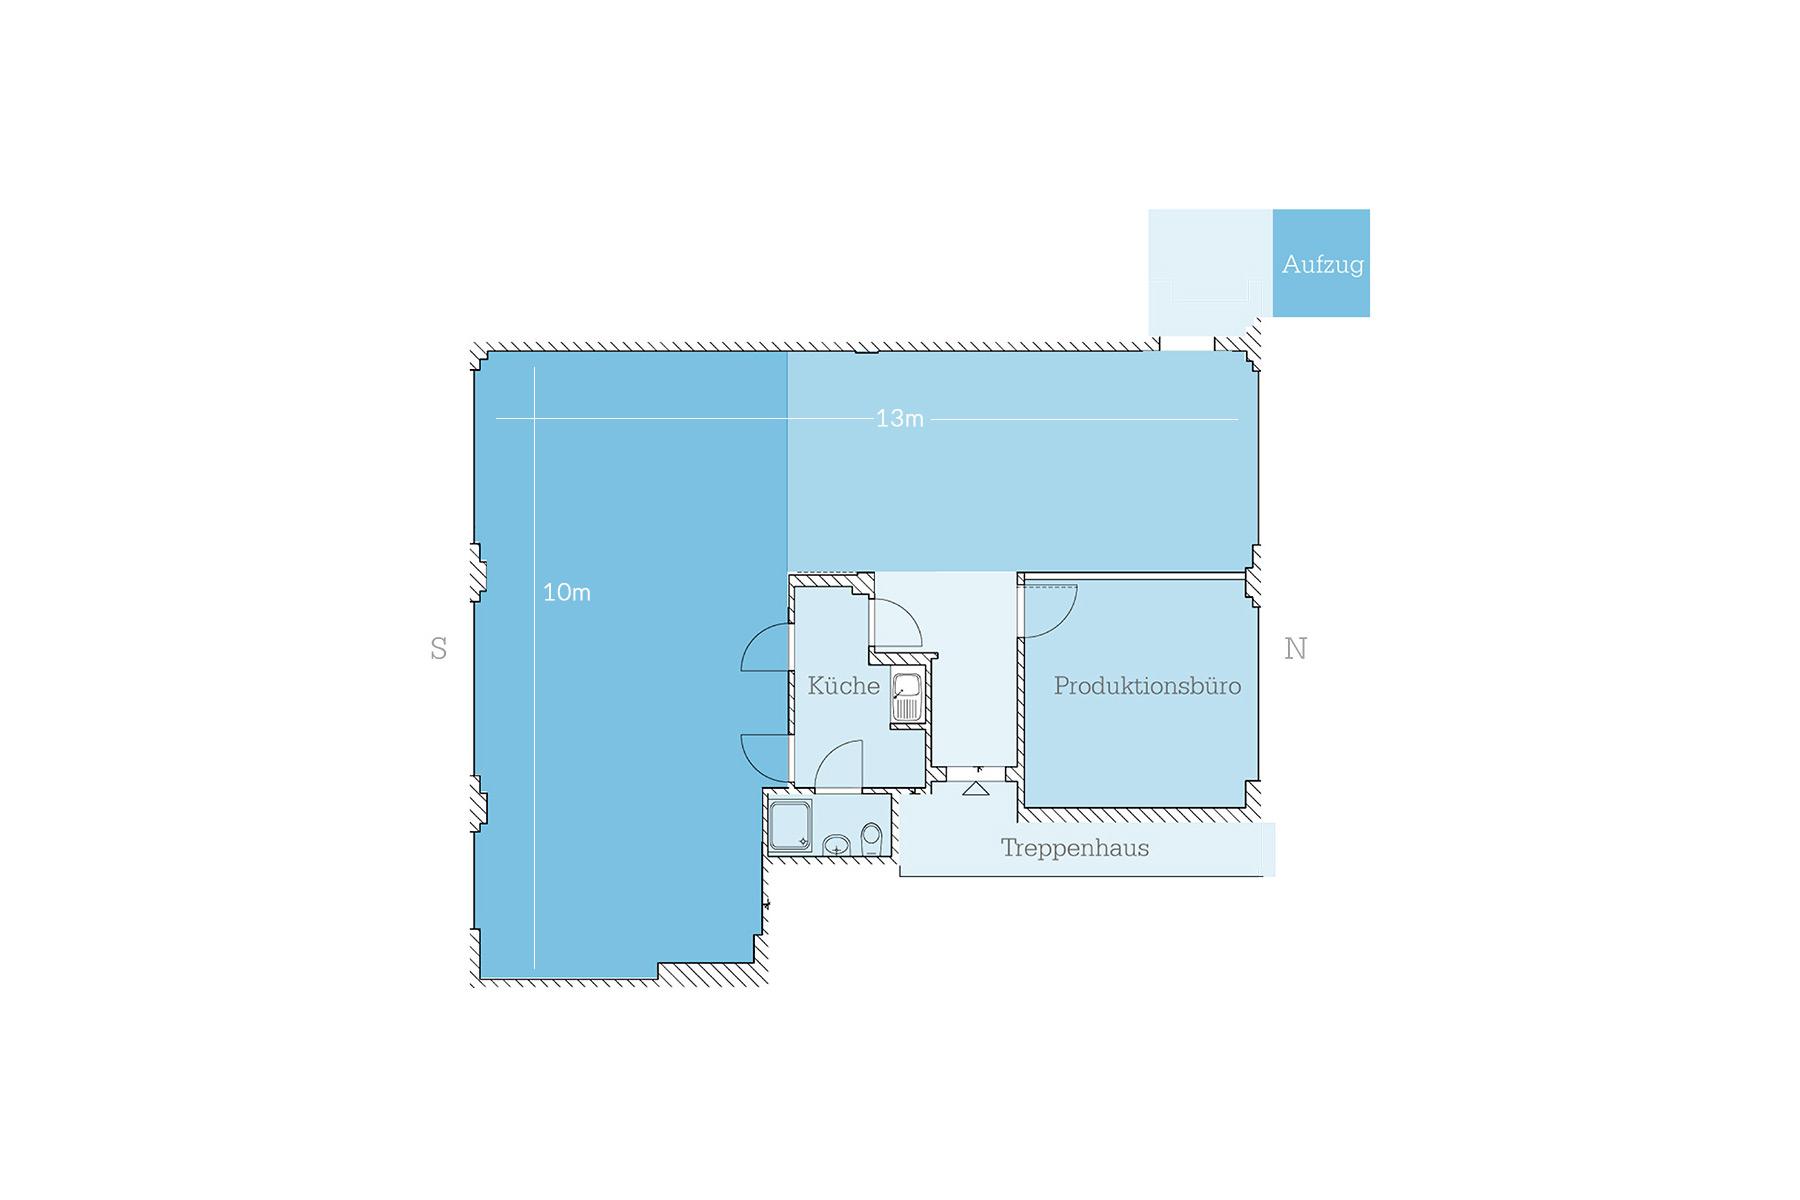 fotomietstudio in berlin ihr tageslicht mietstudio f r. Black Bedroom Furniture Sets. Home Design Ideas